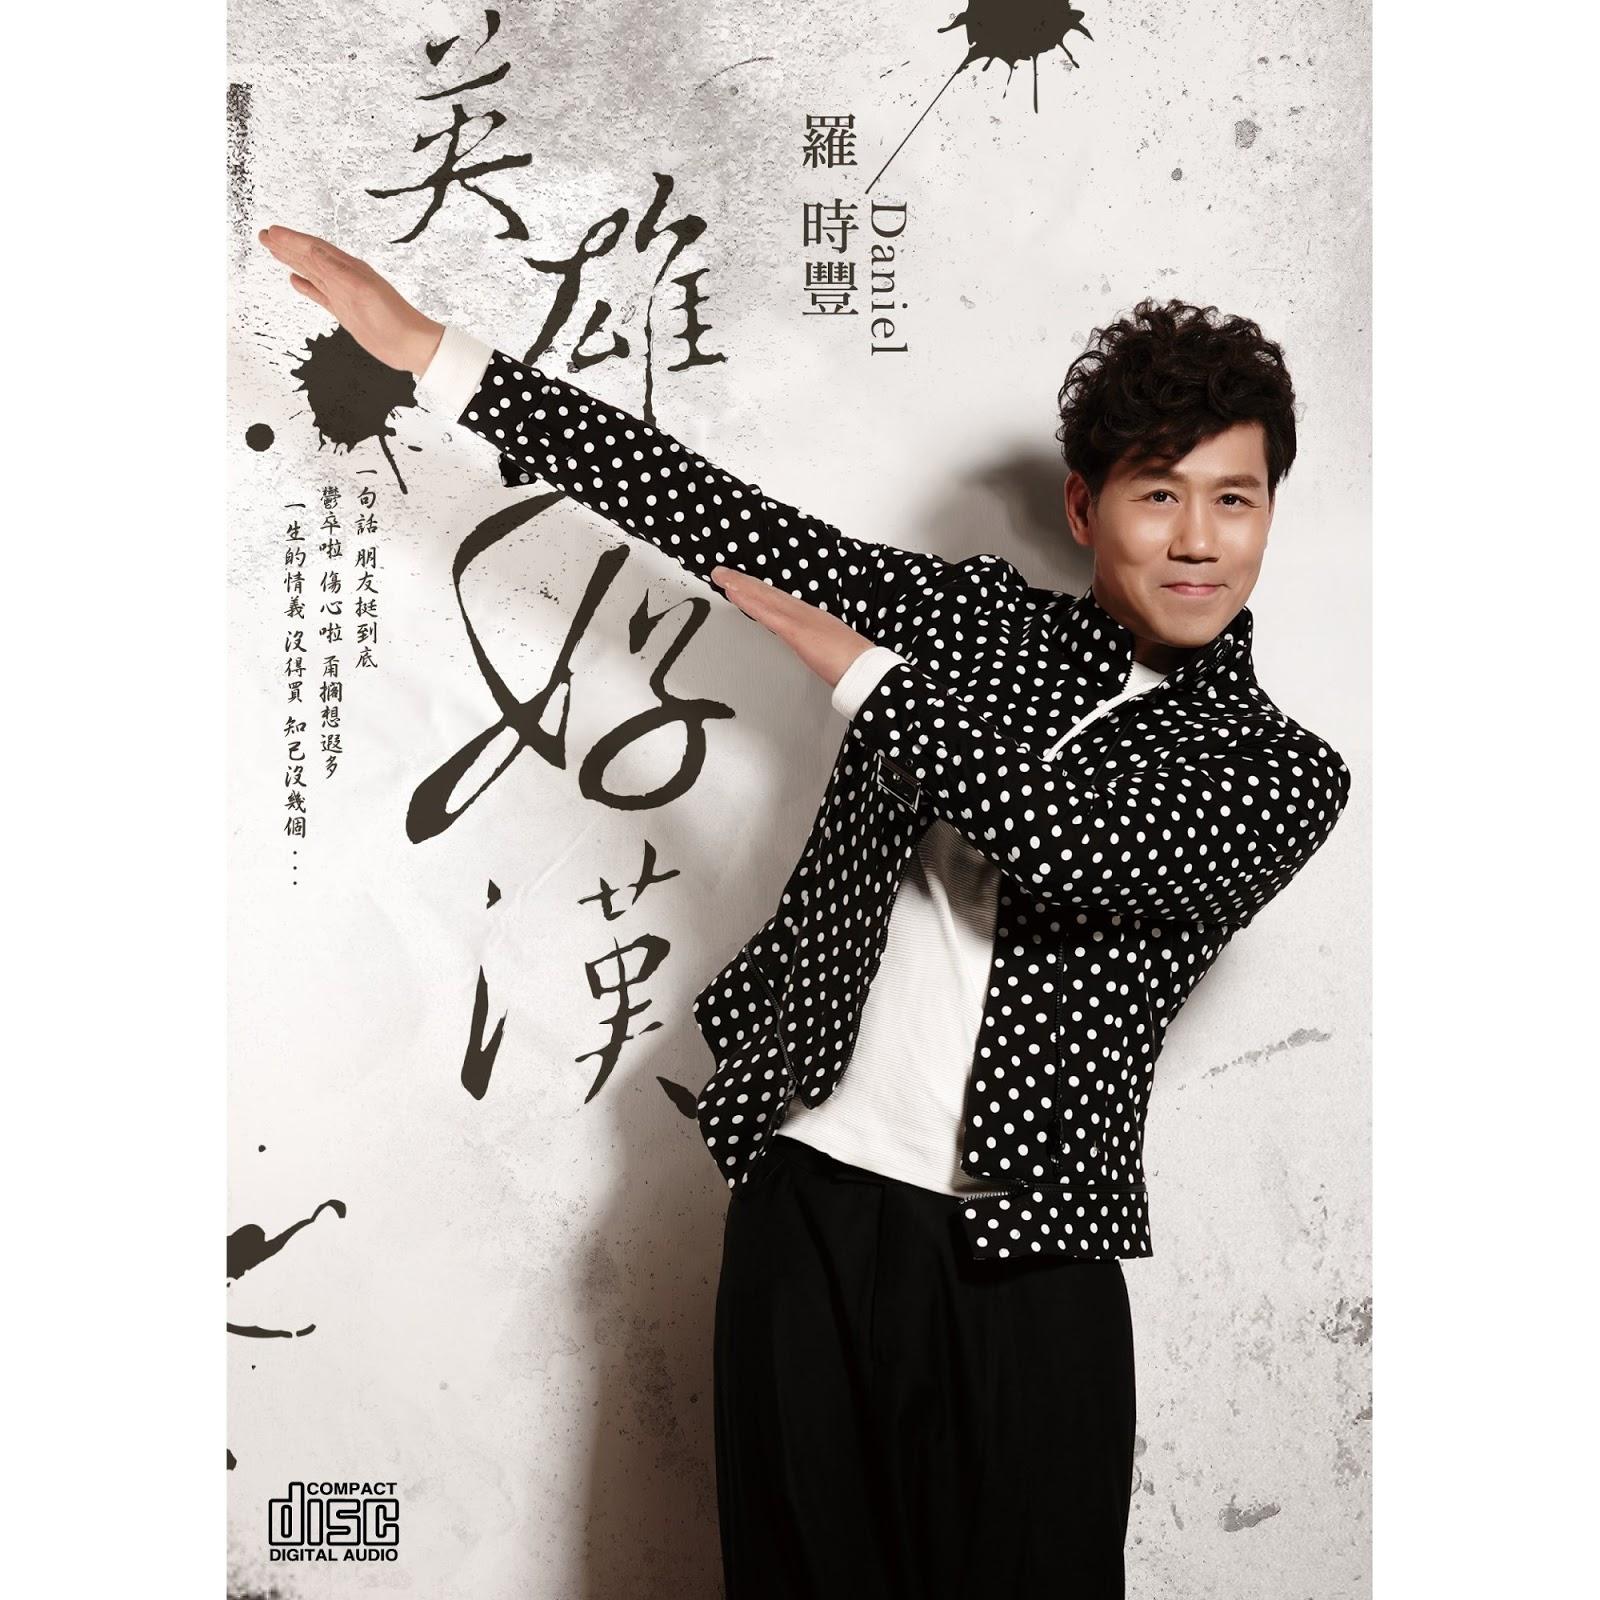 [Album] 英雄好漢 - 羅時豐 Daniel Luo